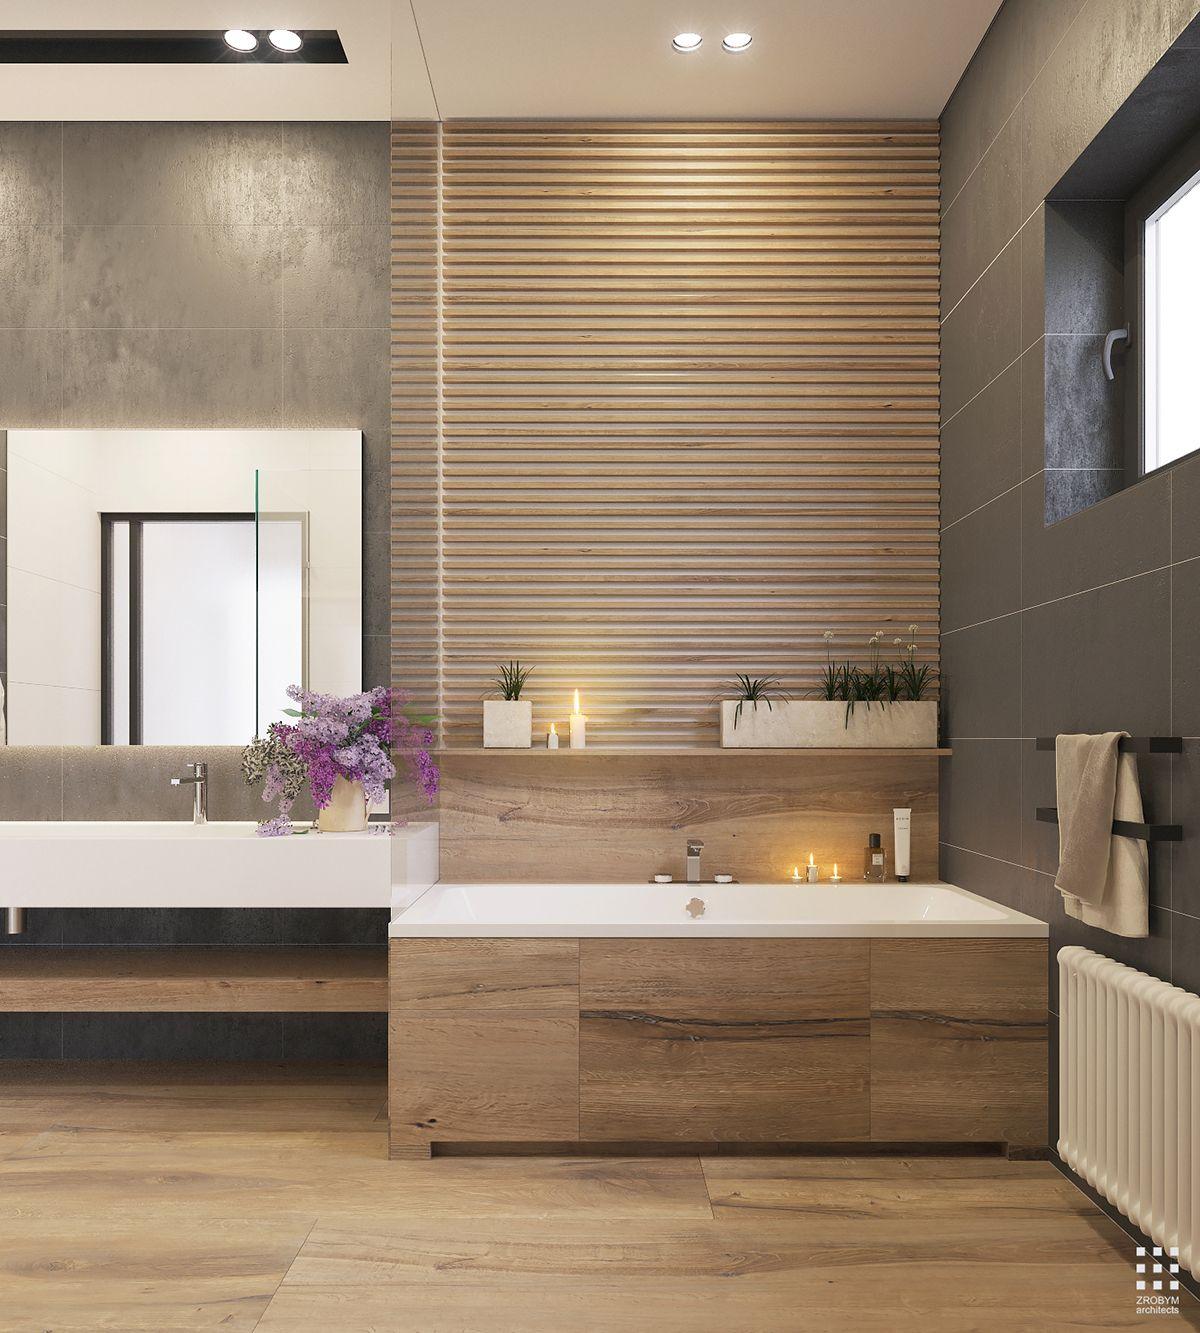 Master bedroom ensuite ideas   sqm concrete on Behance  N Bathroom  Pinterest  Minsk